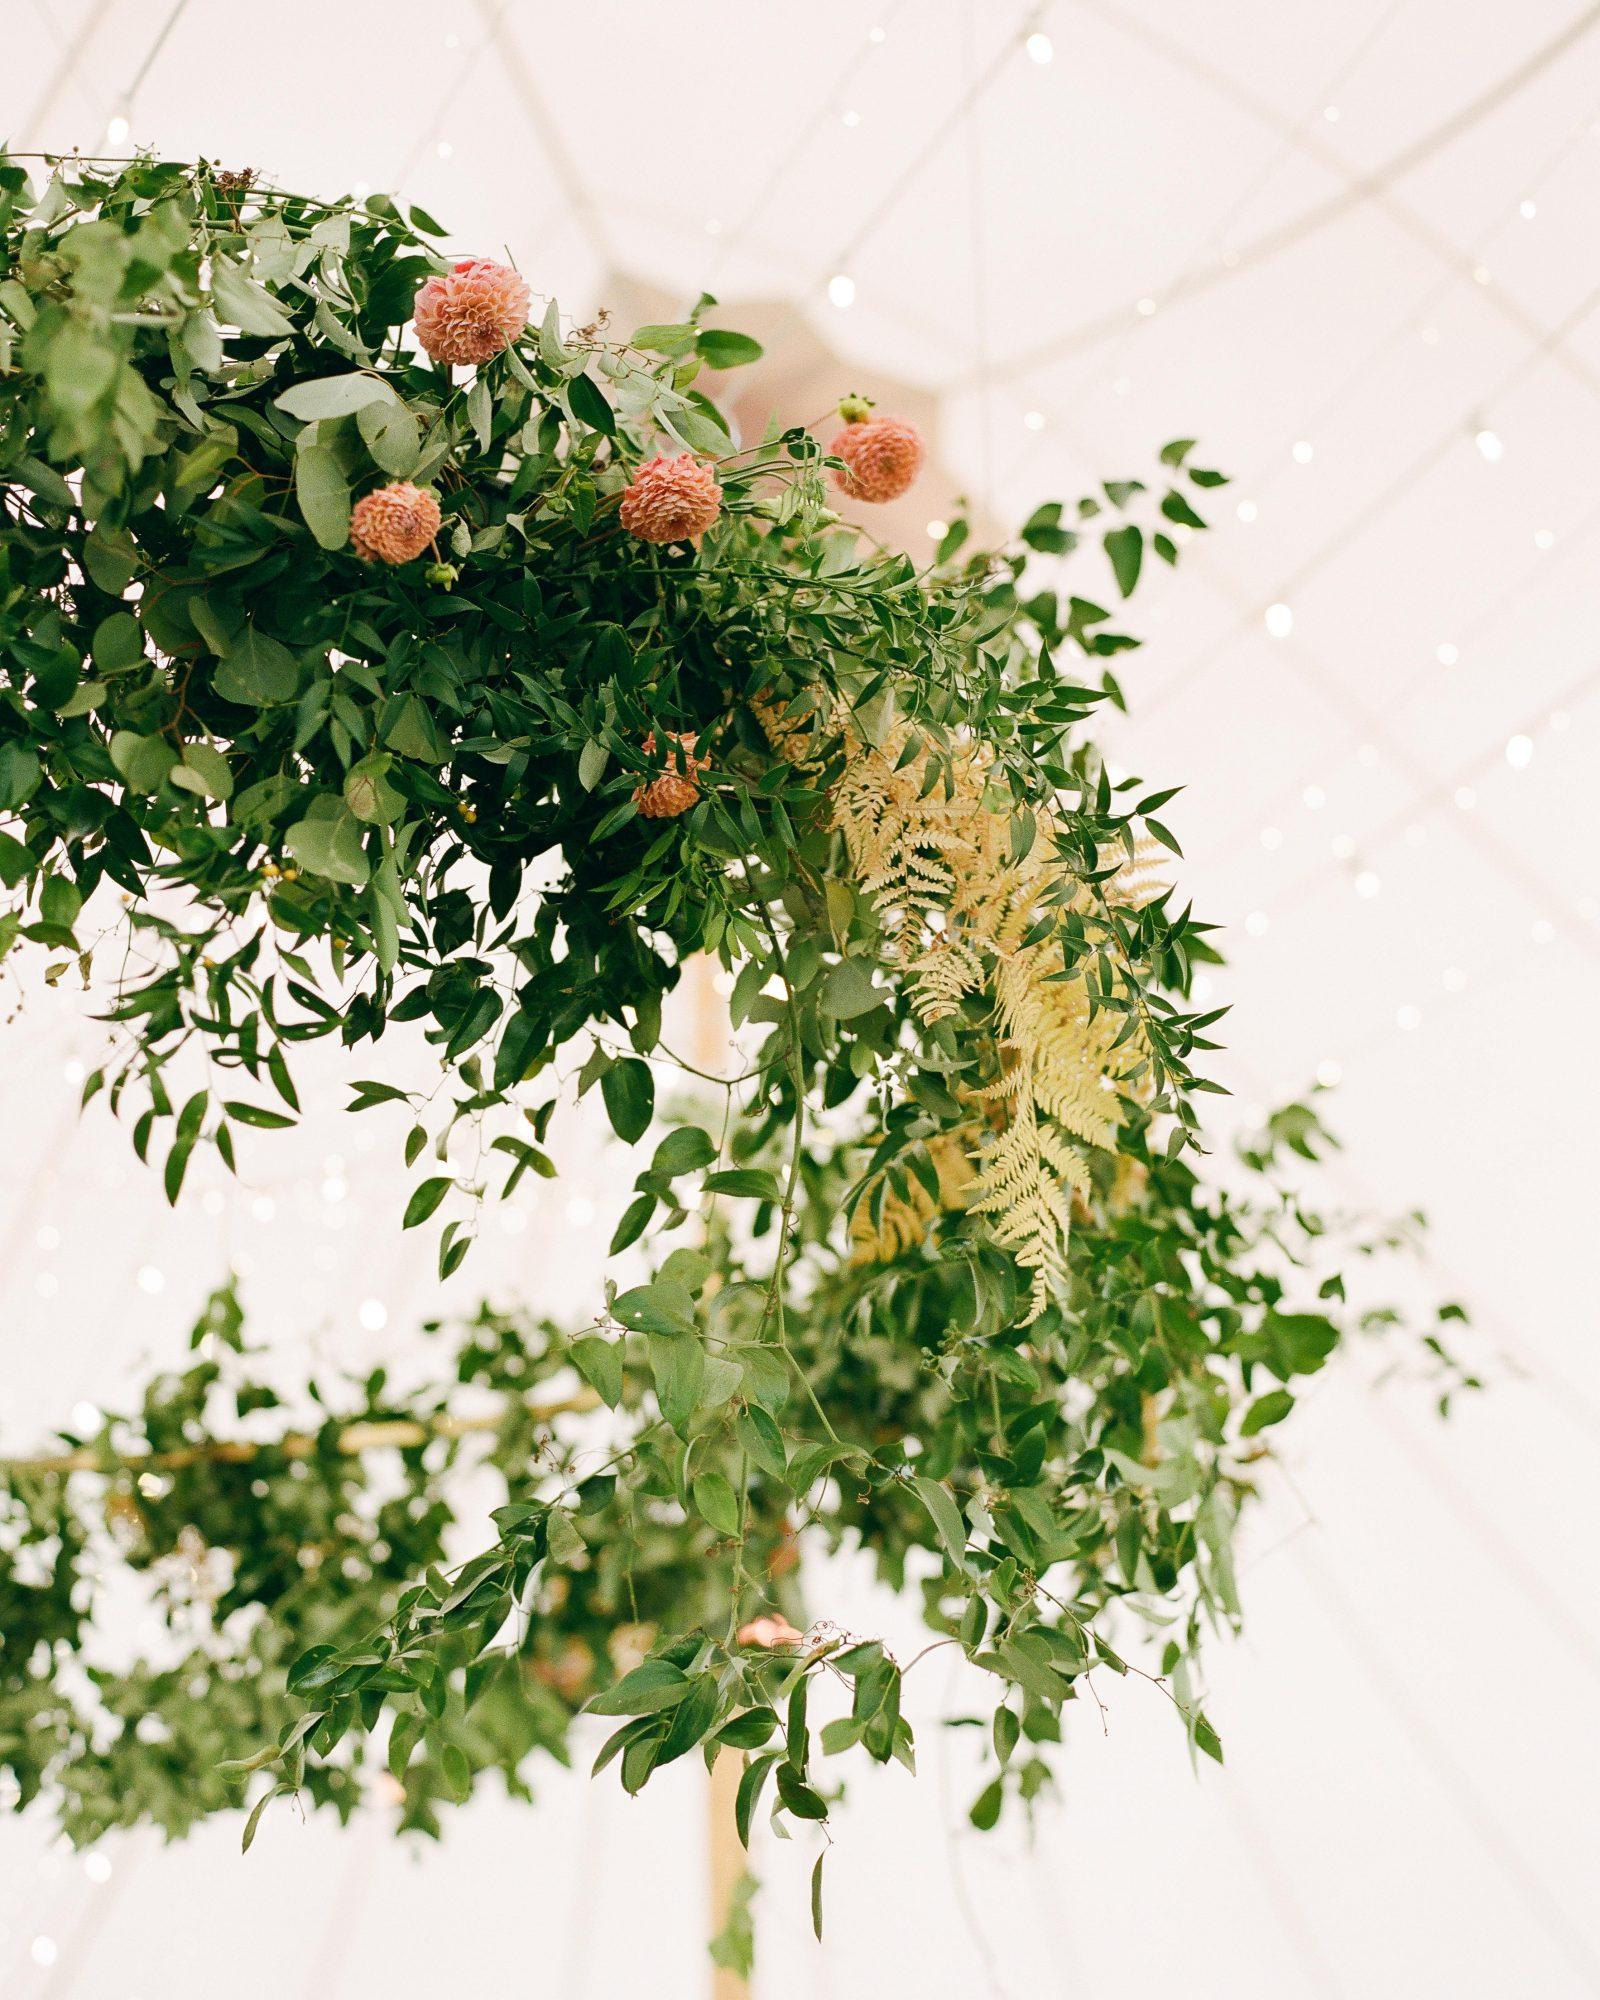 jill phil wedding overhead flower reception decor